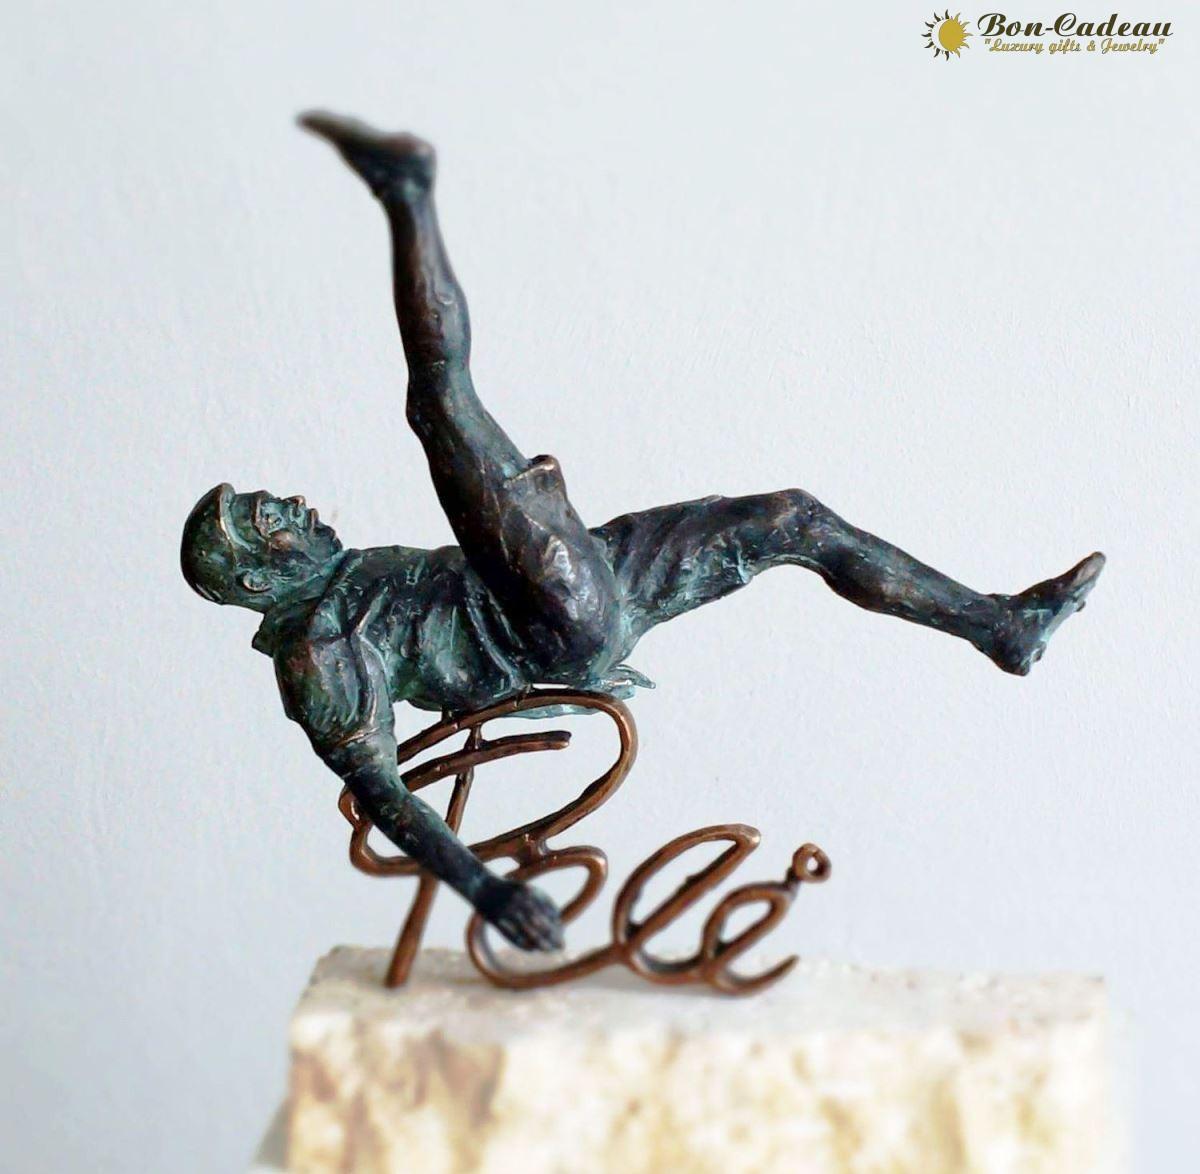 Скульптура из бронзы Пеле